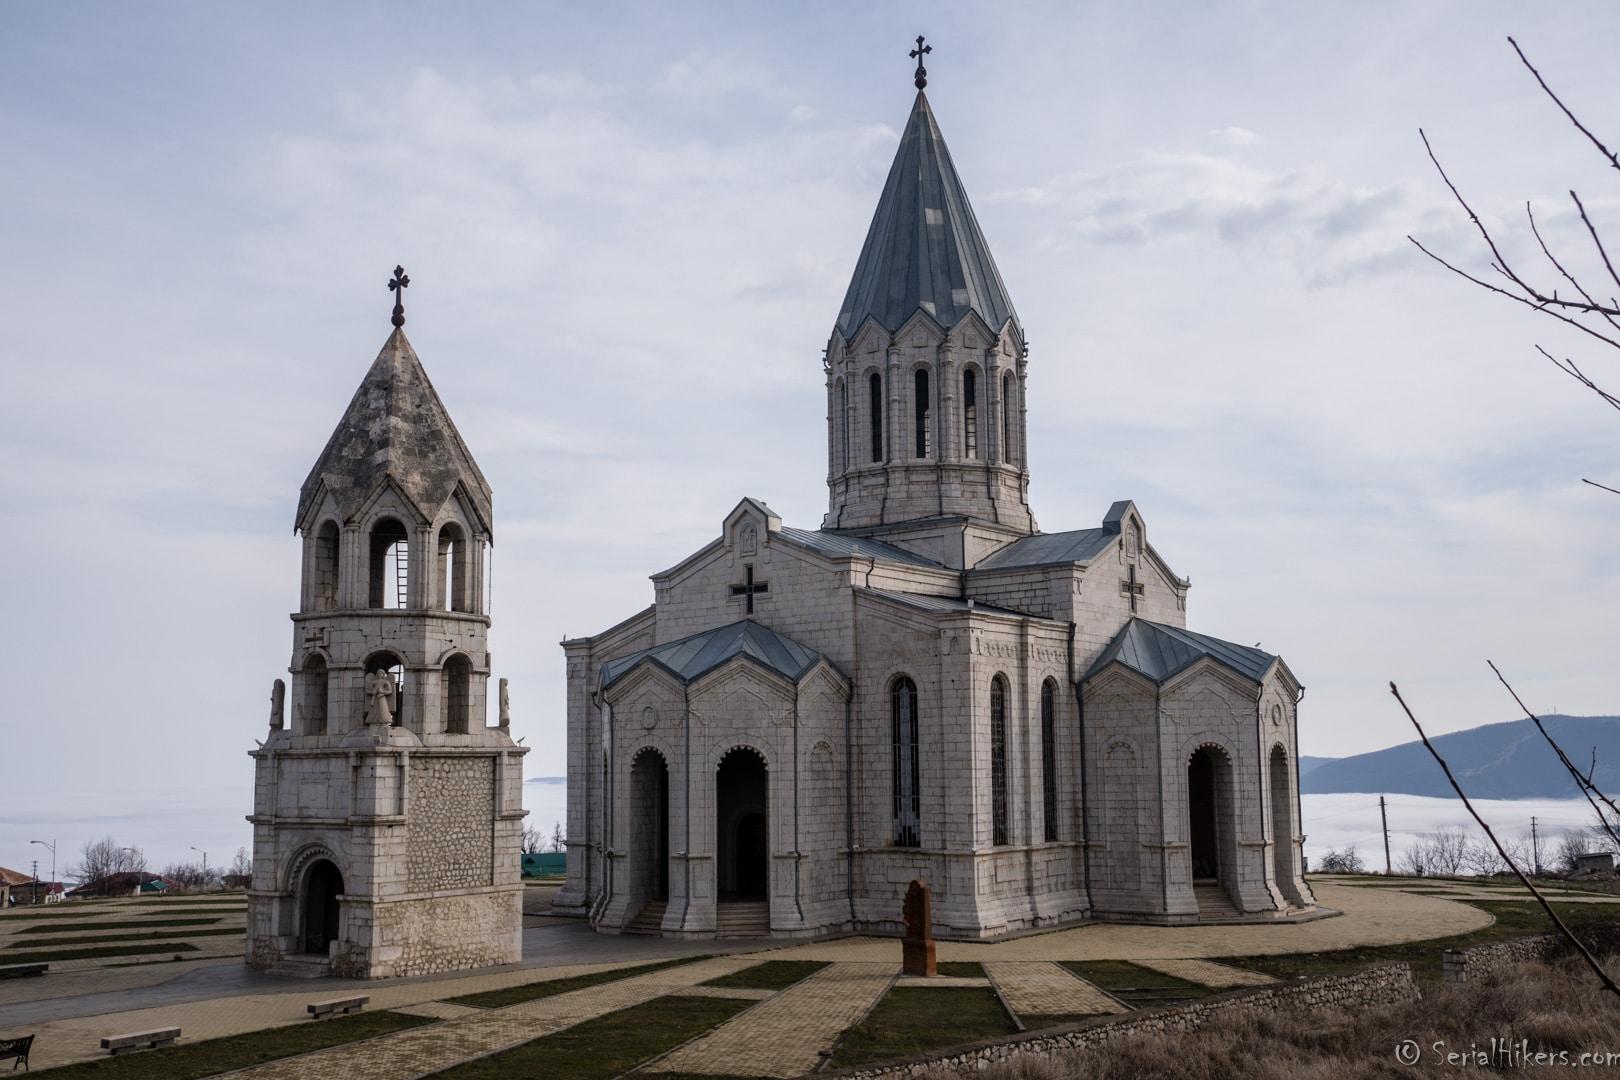 SerialHikers stop autostop world monde tour hitchhiking aventure adventure alternative travel voyage sans avion no fly caucase armenia armenie Shushi